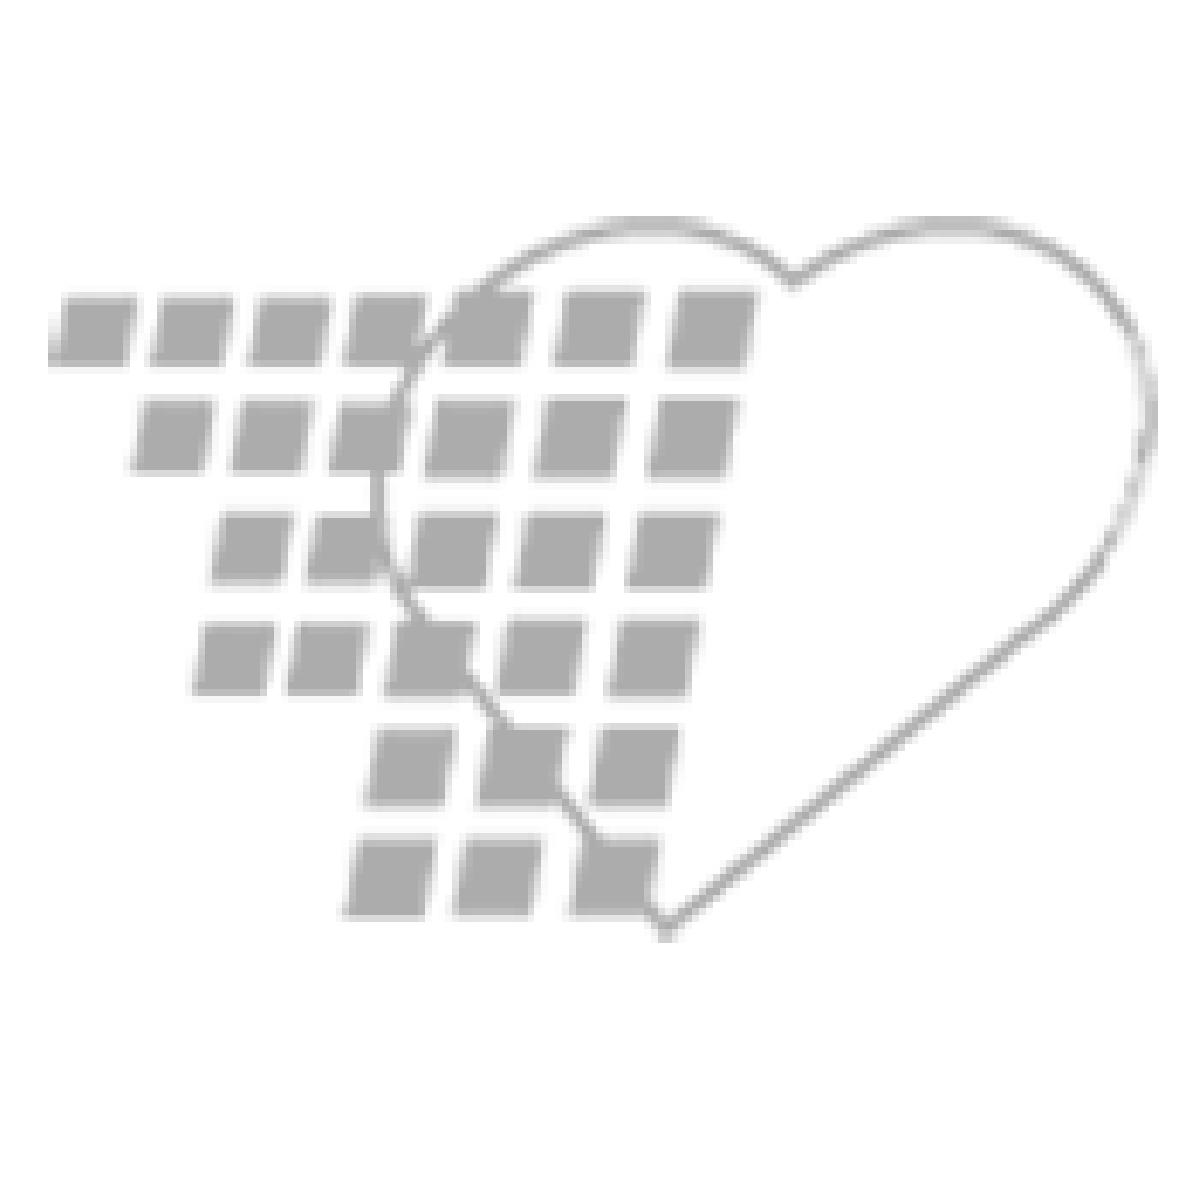 07-71-0409 Endotracheal Tube Uncuffed 4.5